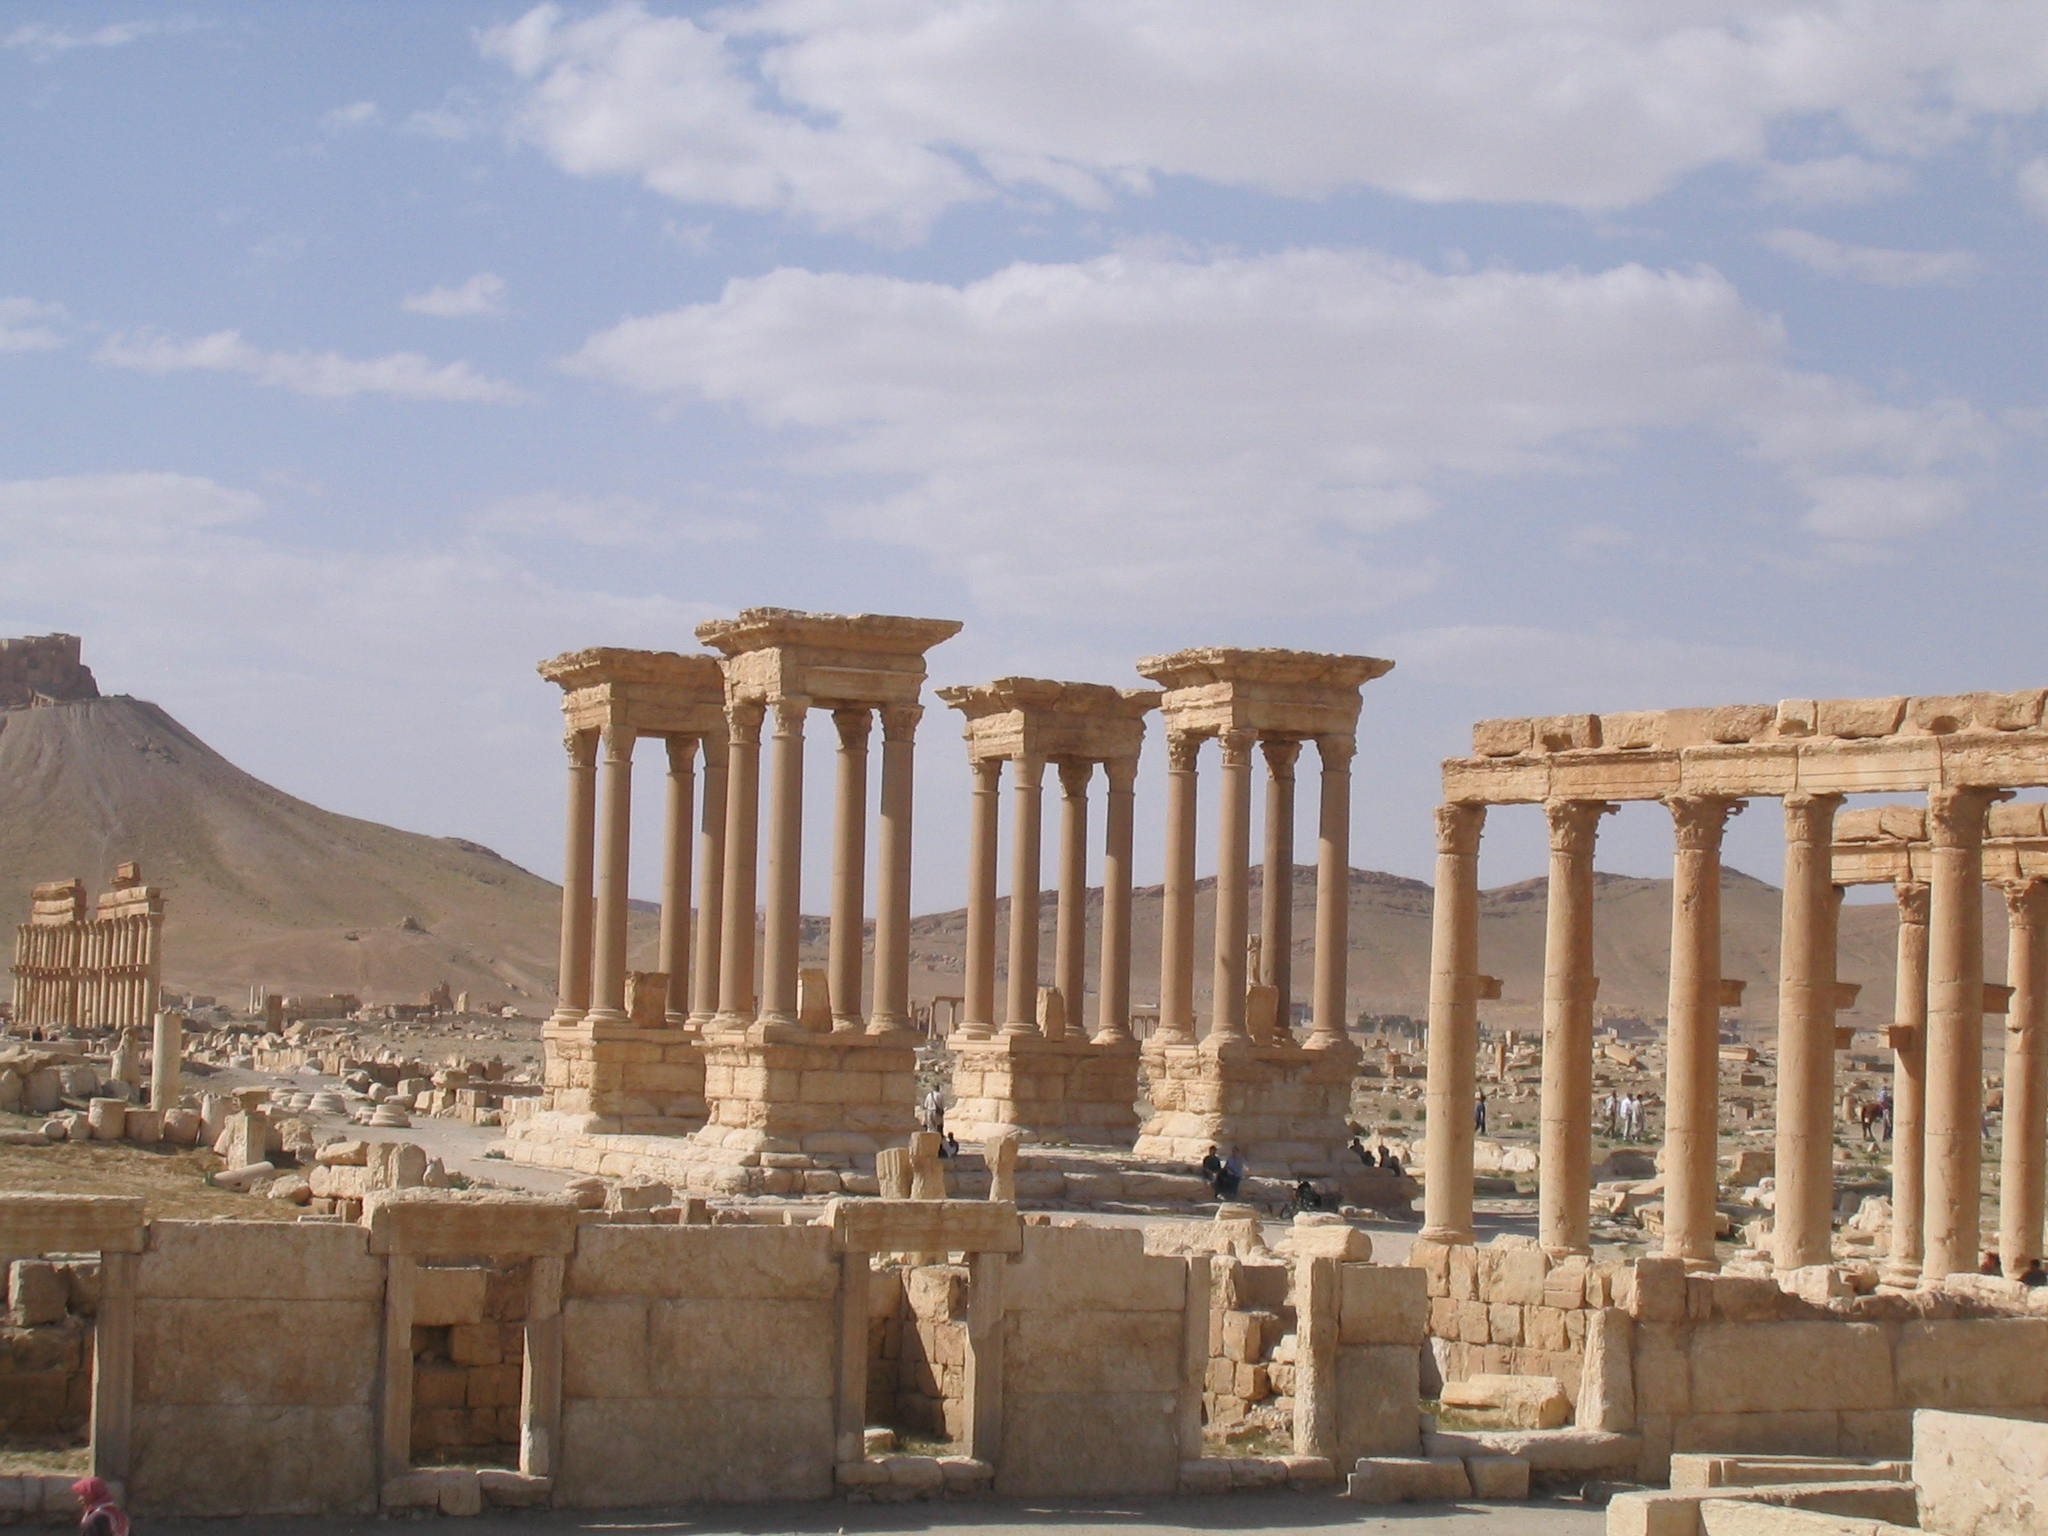 Roundabout, Palmyra, Syria, 2004